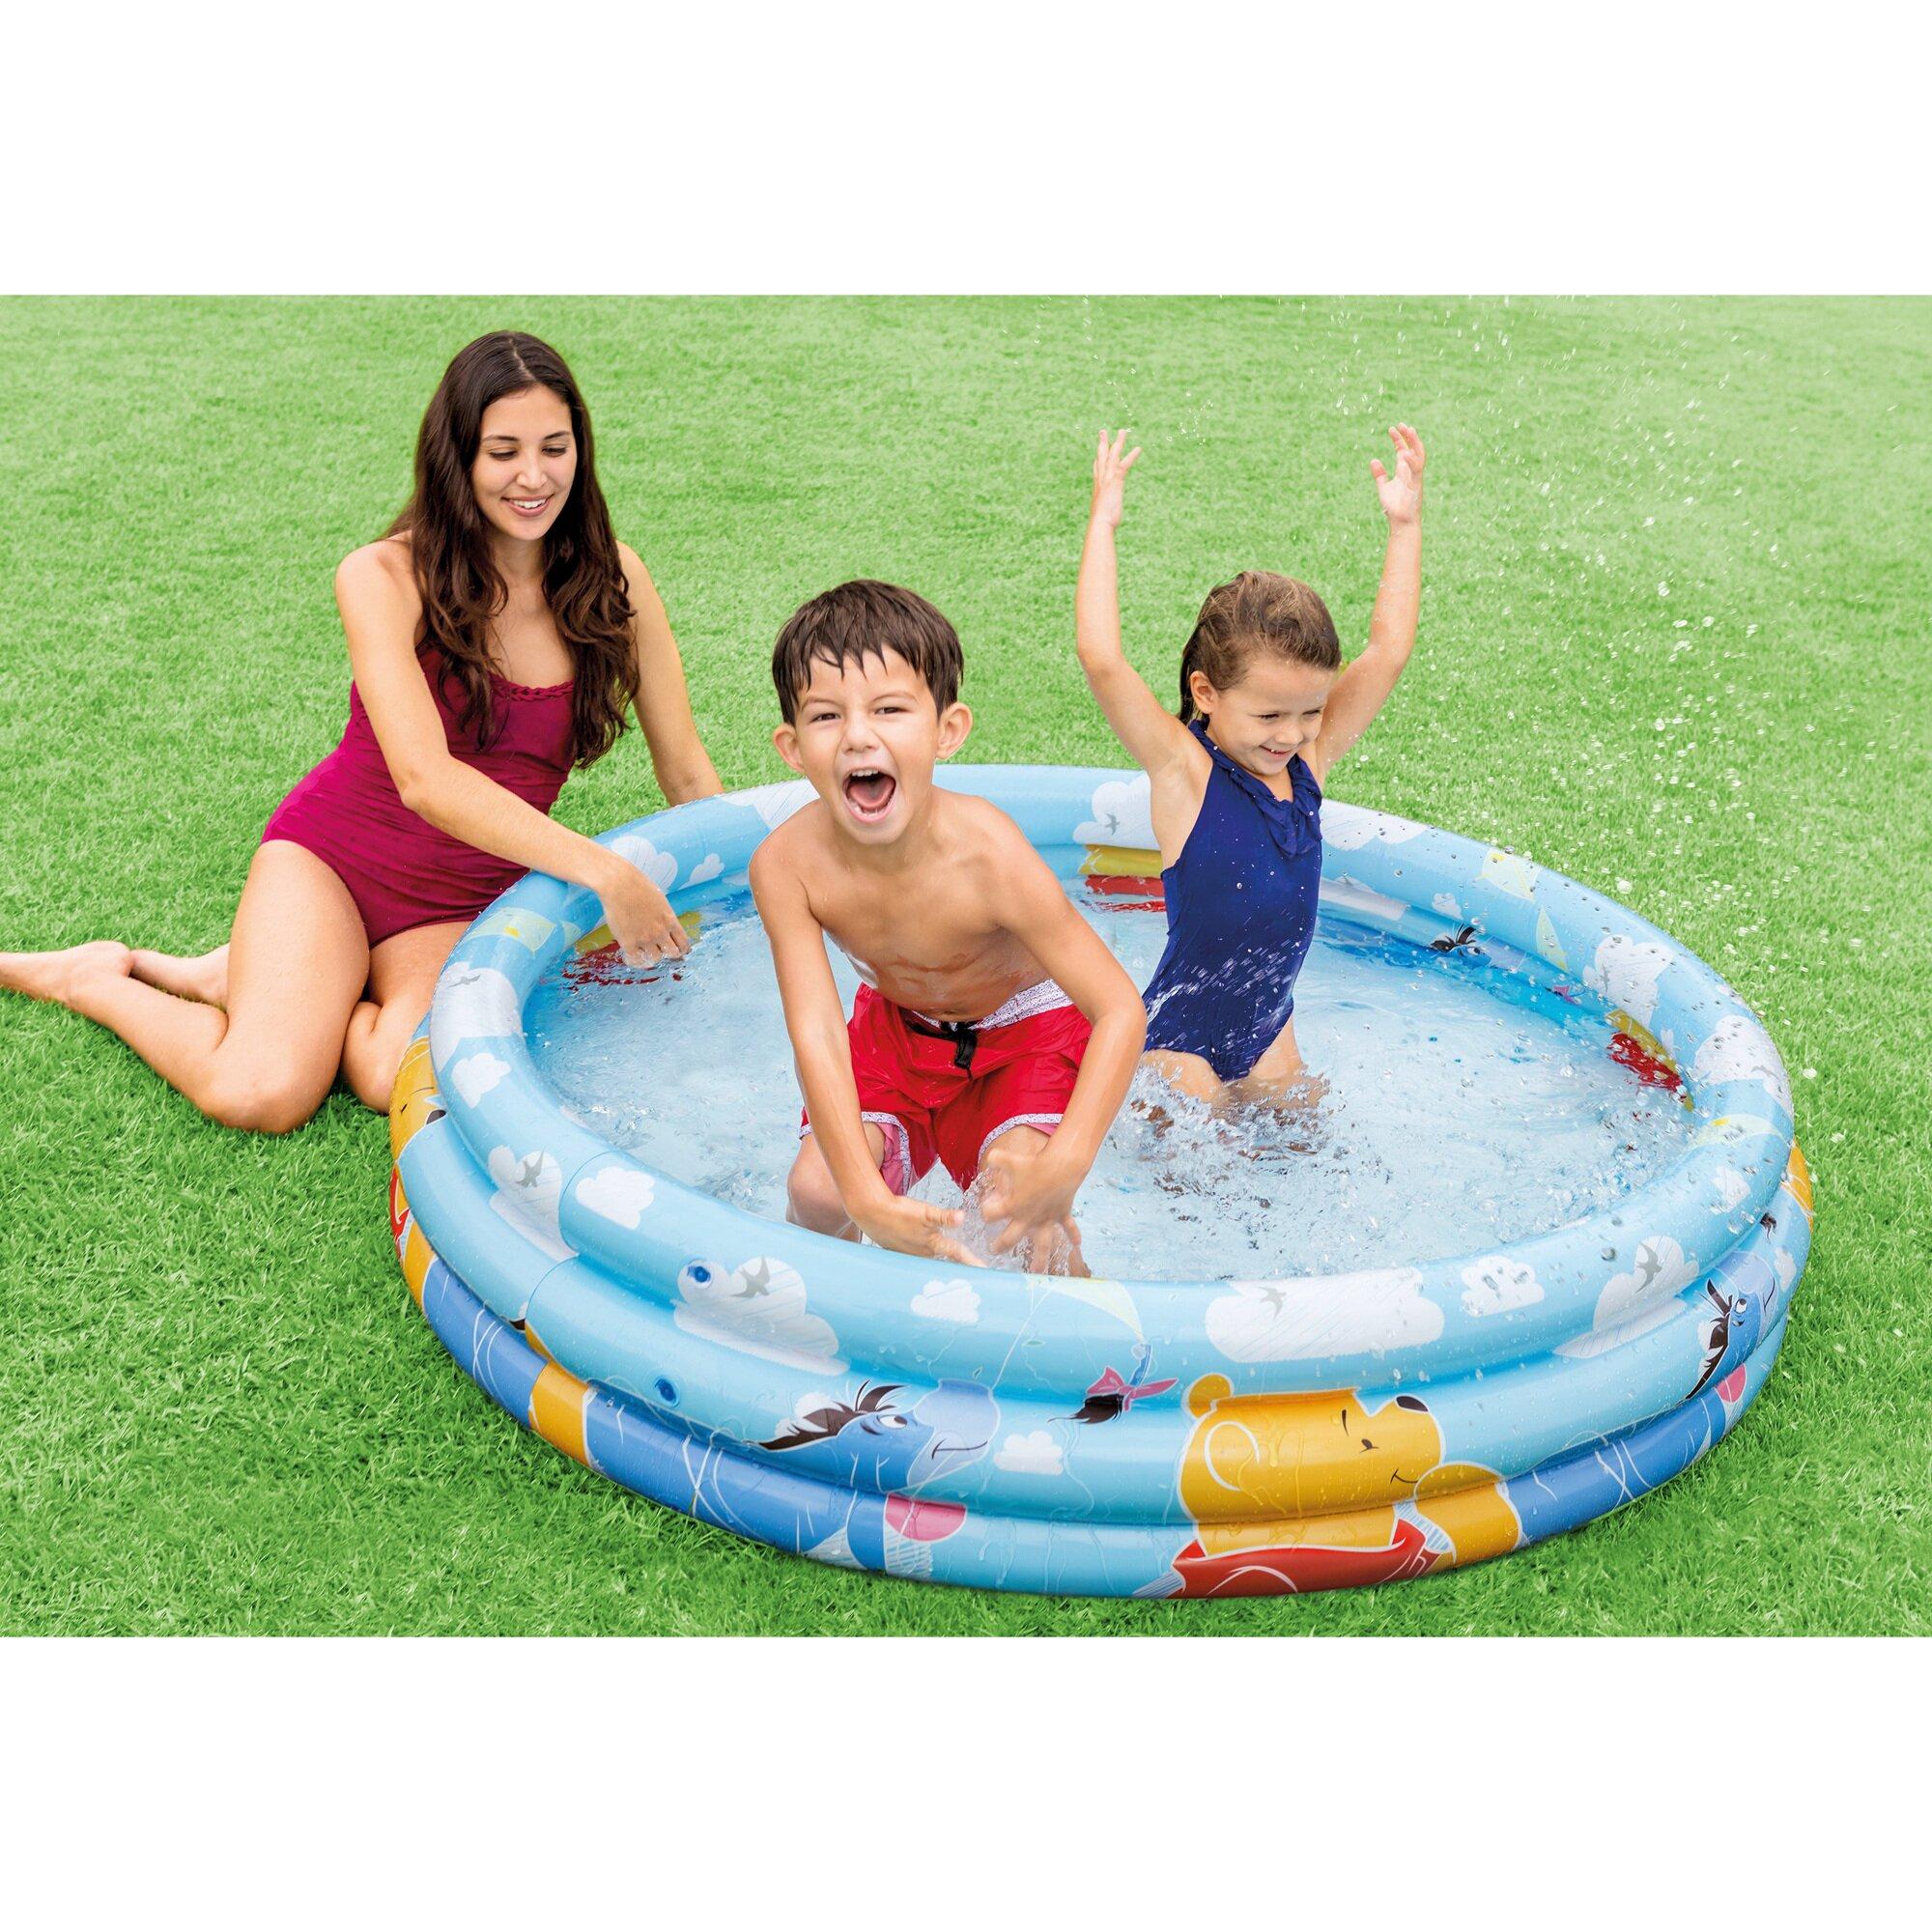 disney-winnie-puuh-pool-3-ring